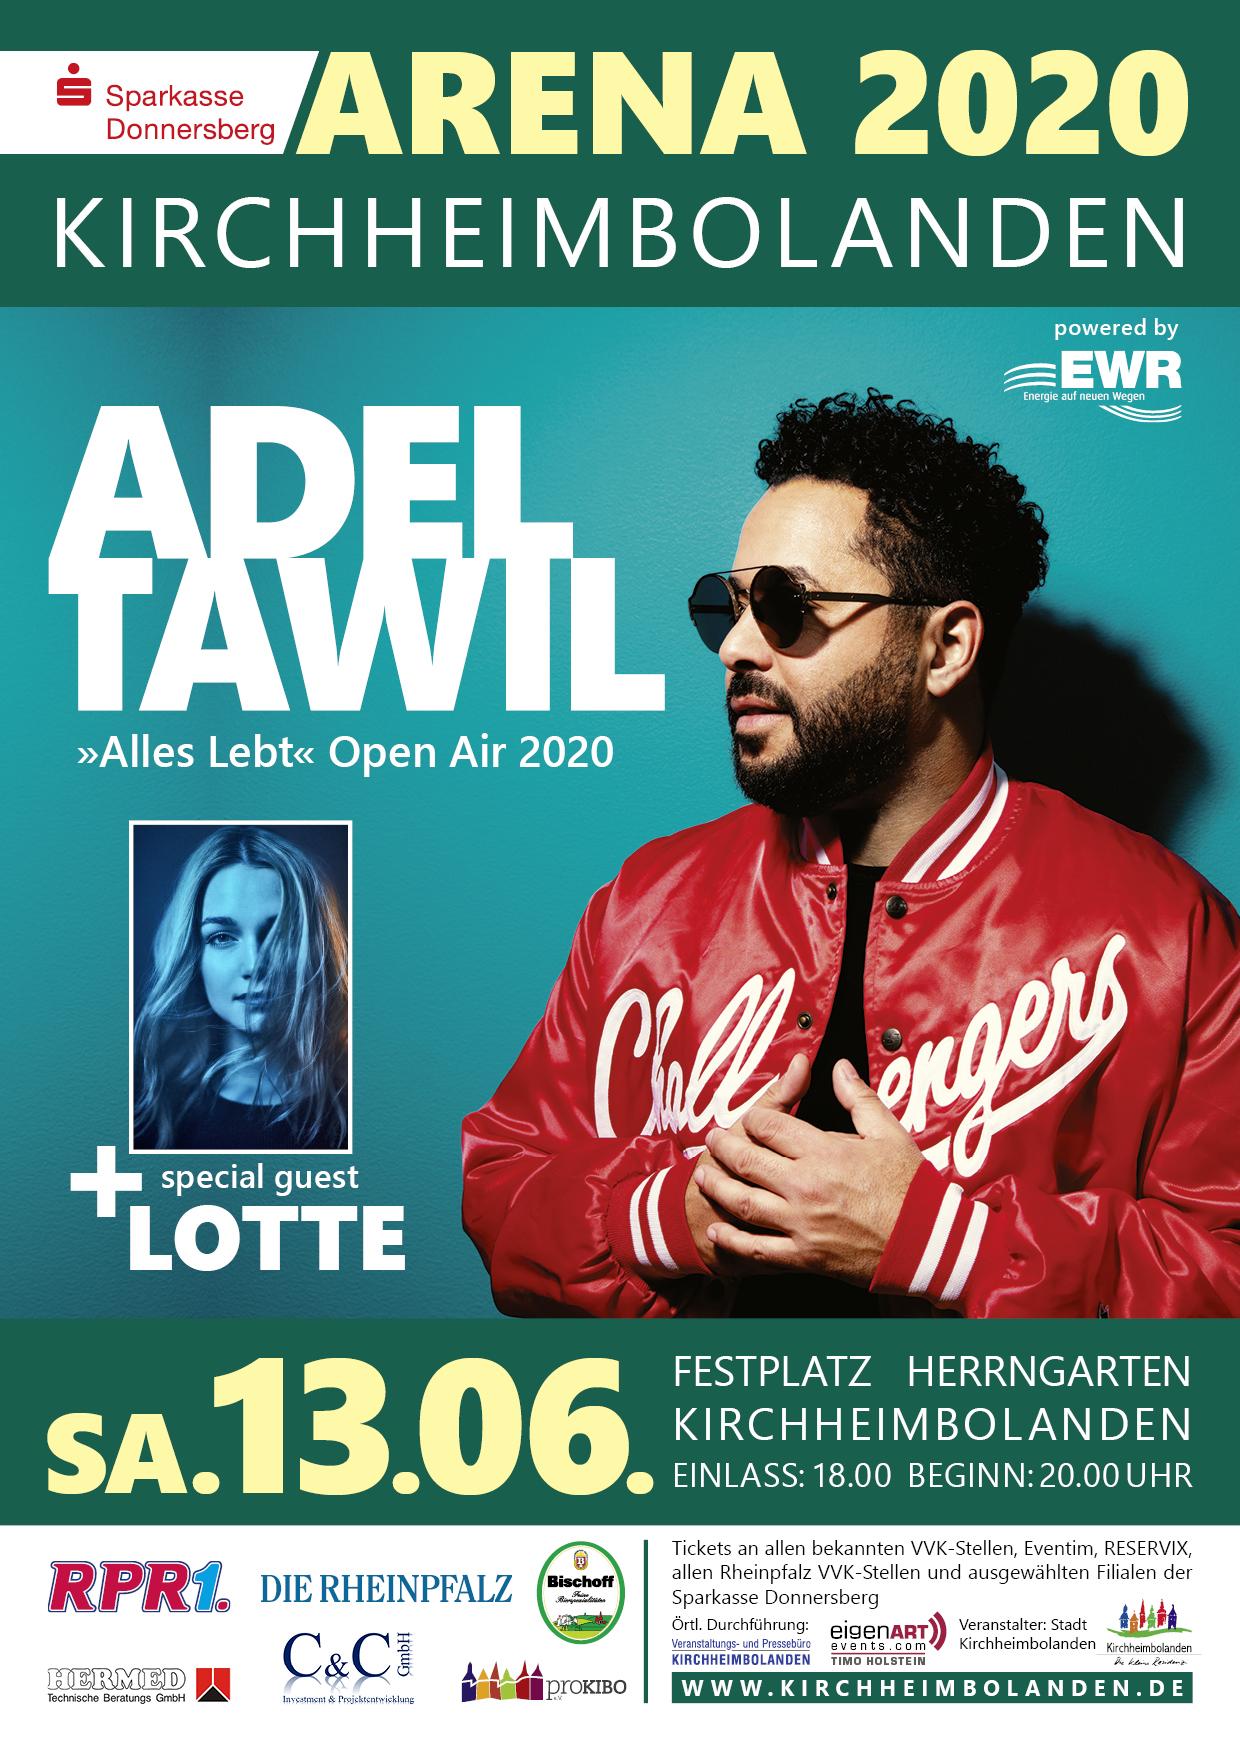 ADEL TAWIL & Lotte in Kirchheimbolanden ARENA 2020 präsentiert von proKIBO e.V.